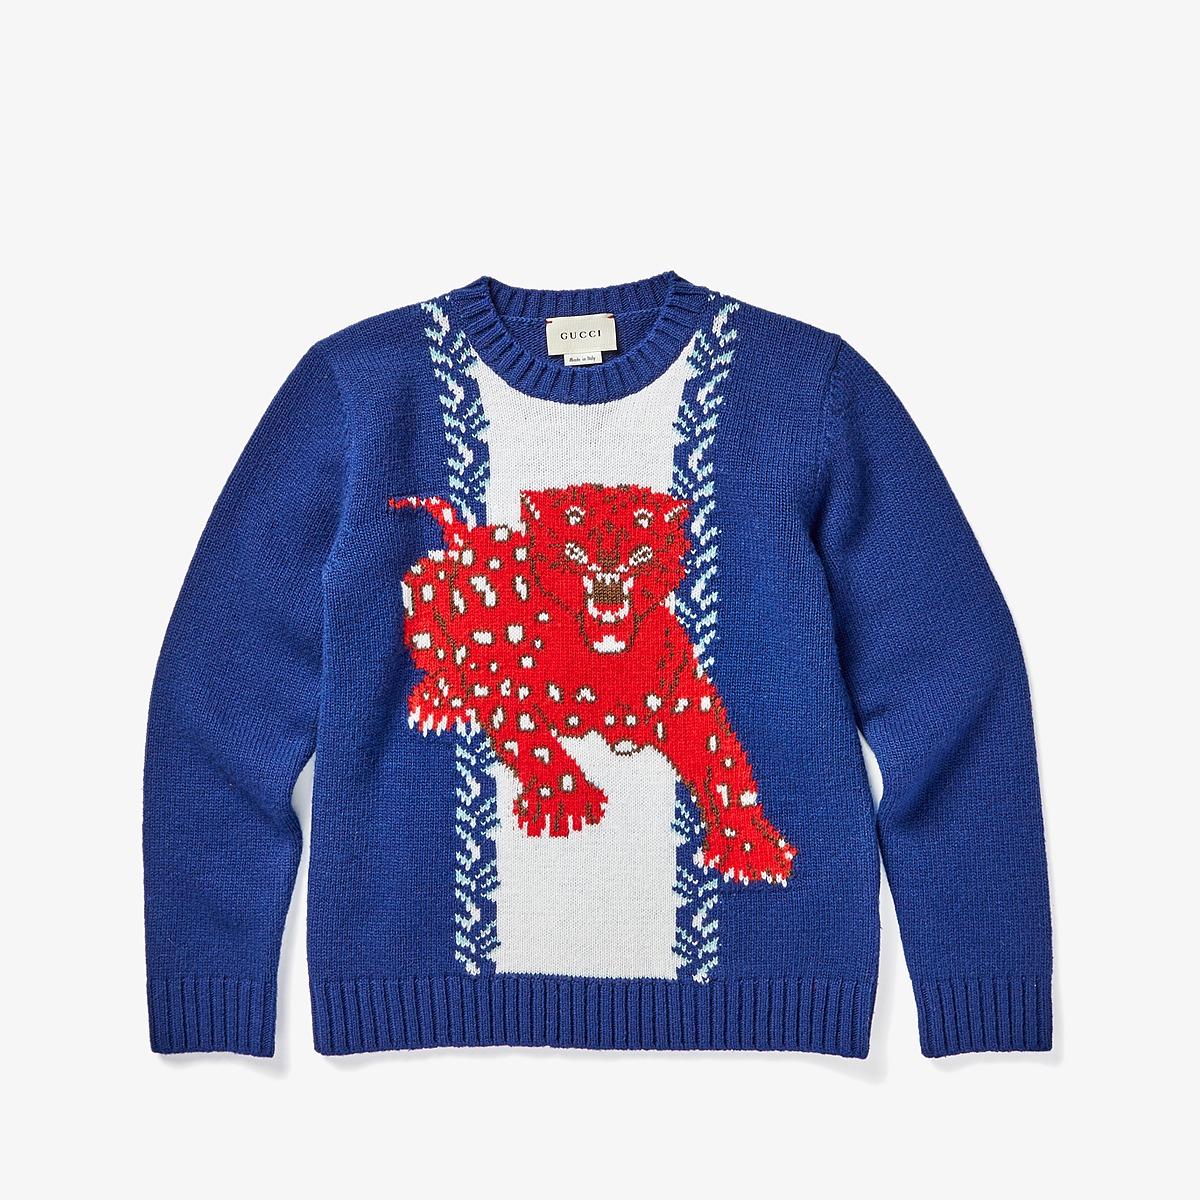 Gucci Kids - Knitwear 475584X1492 (Little Kids/Big Kids) (Indigo/Brown) Boys Clothing